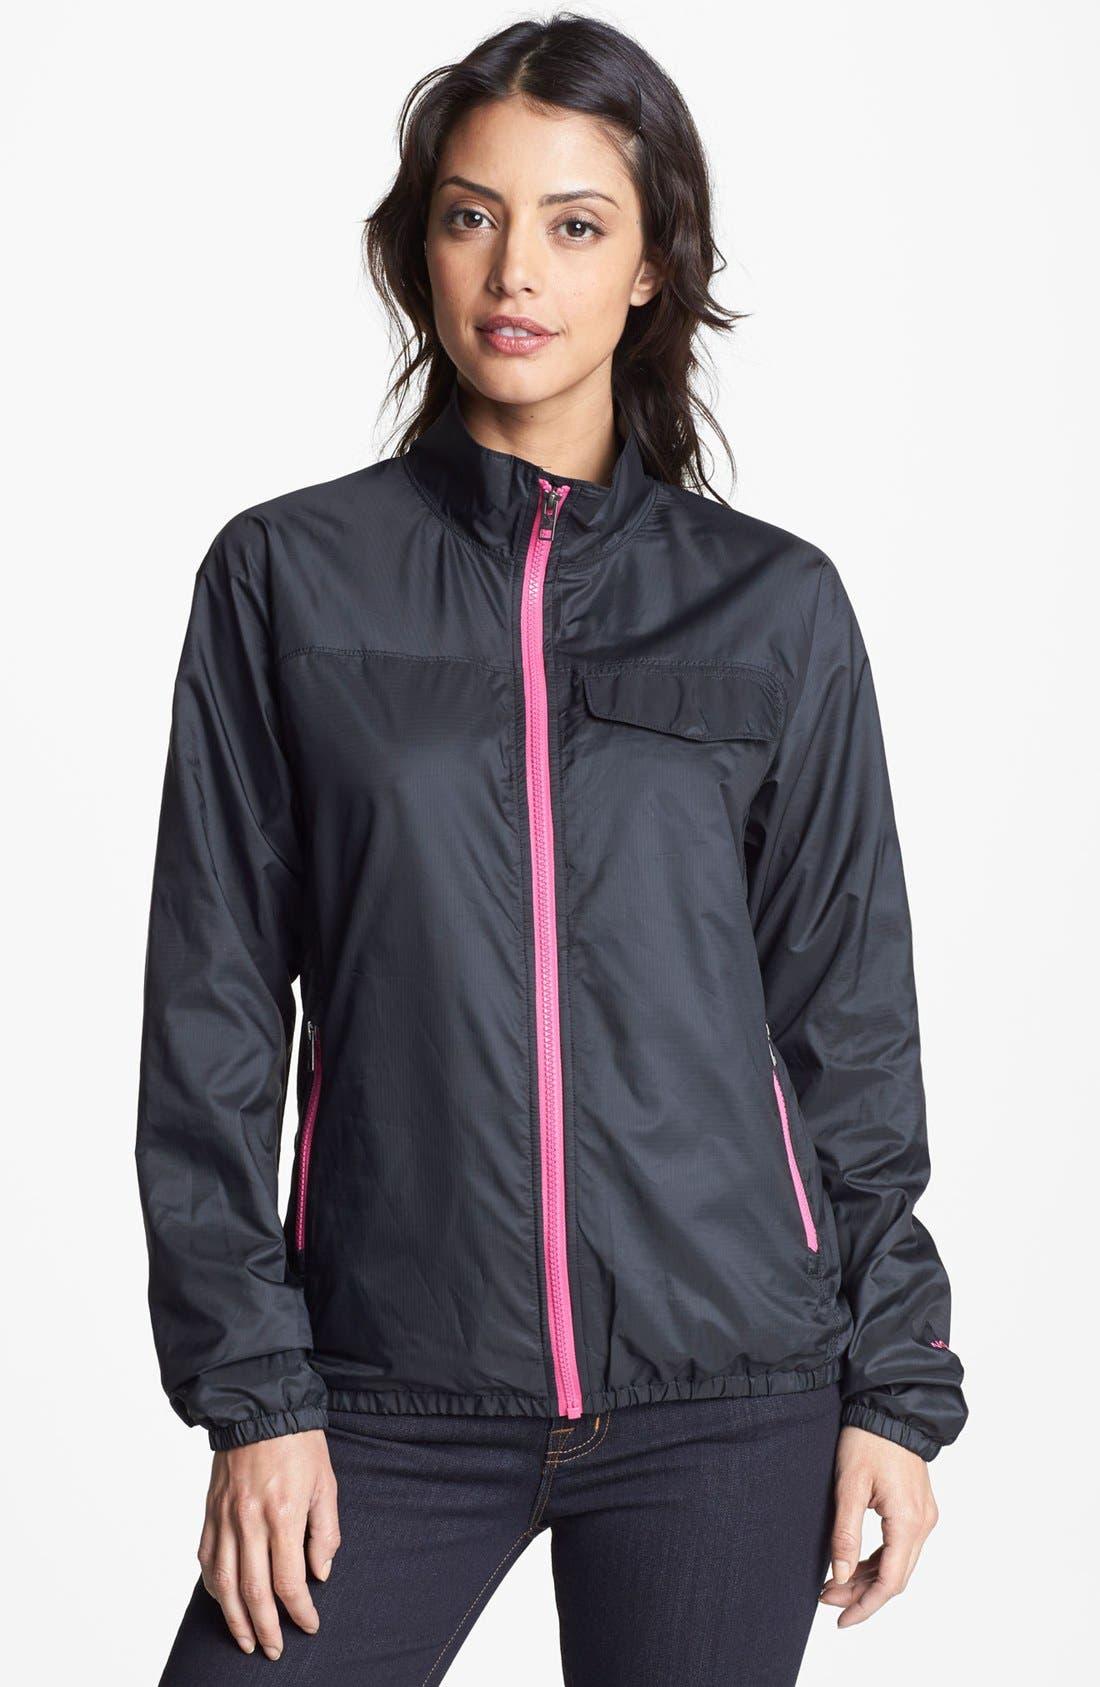 Main Image - The North Face 'Penelope' Jacket